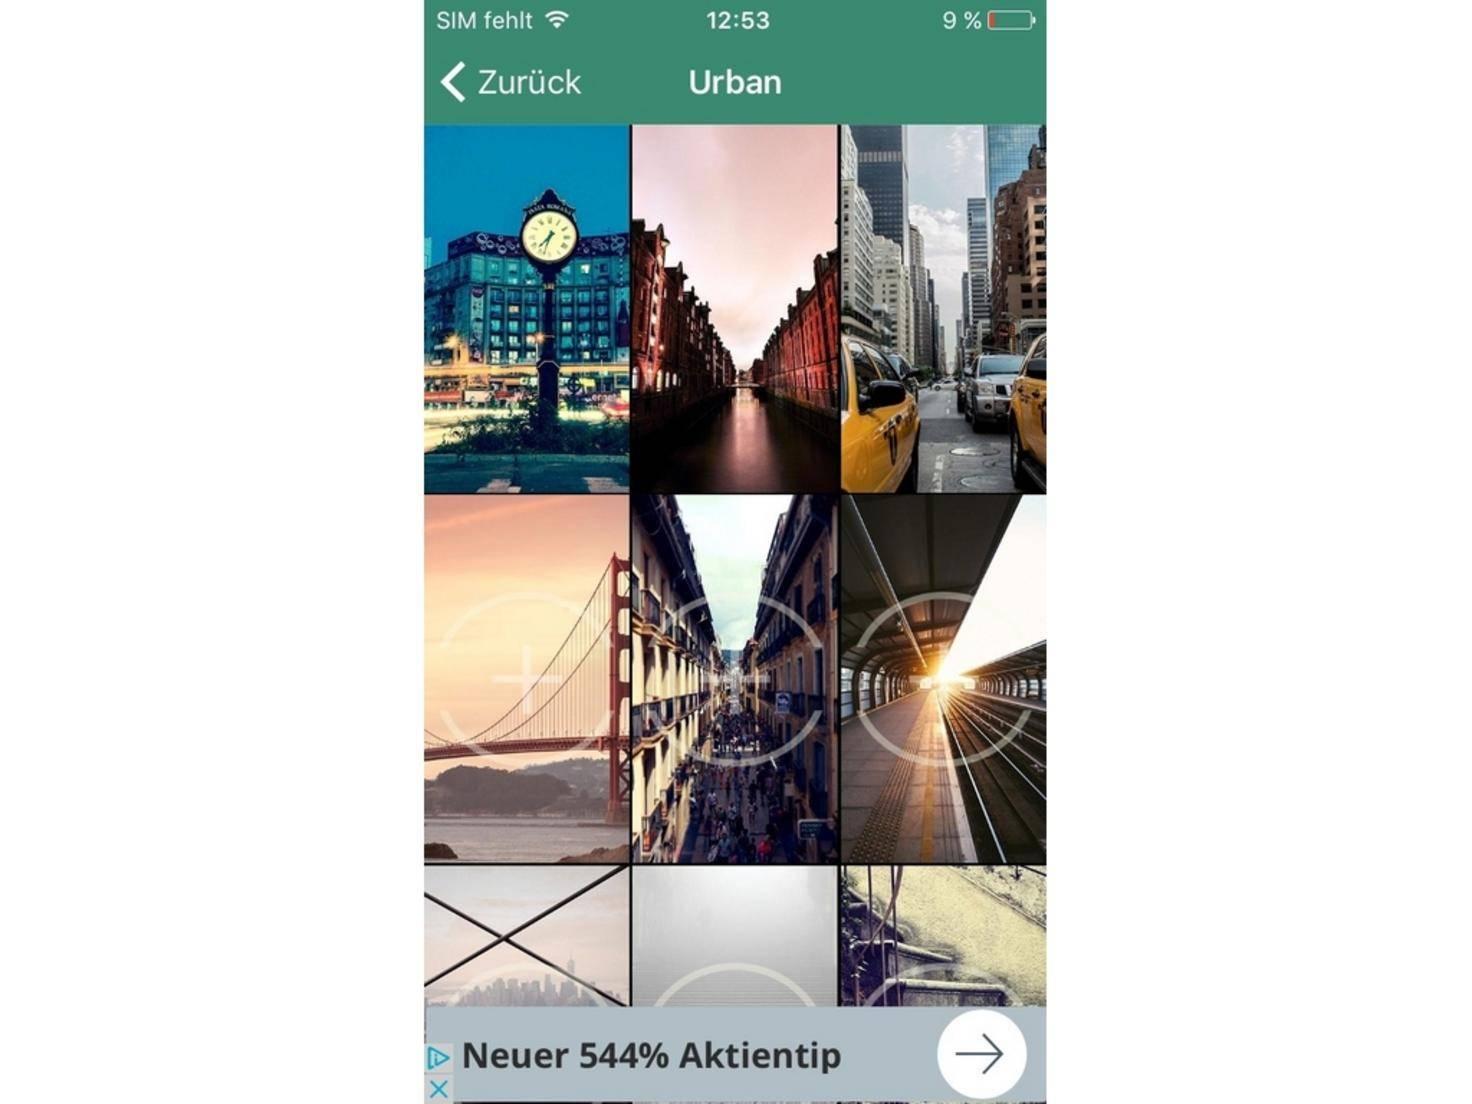 Wallpaper-WhatsApp-iPhone-02